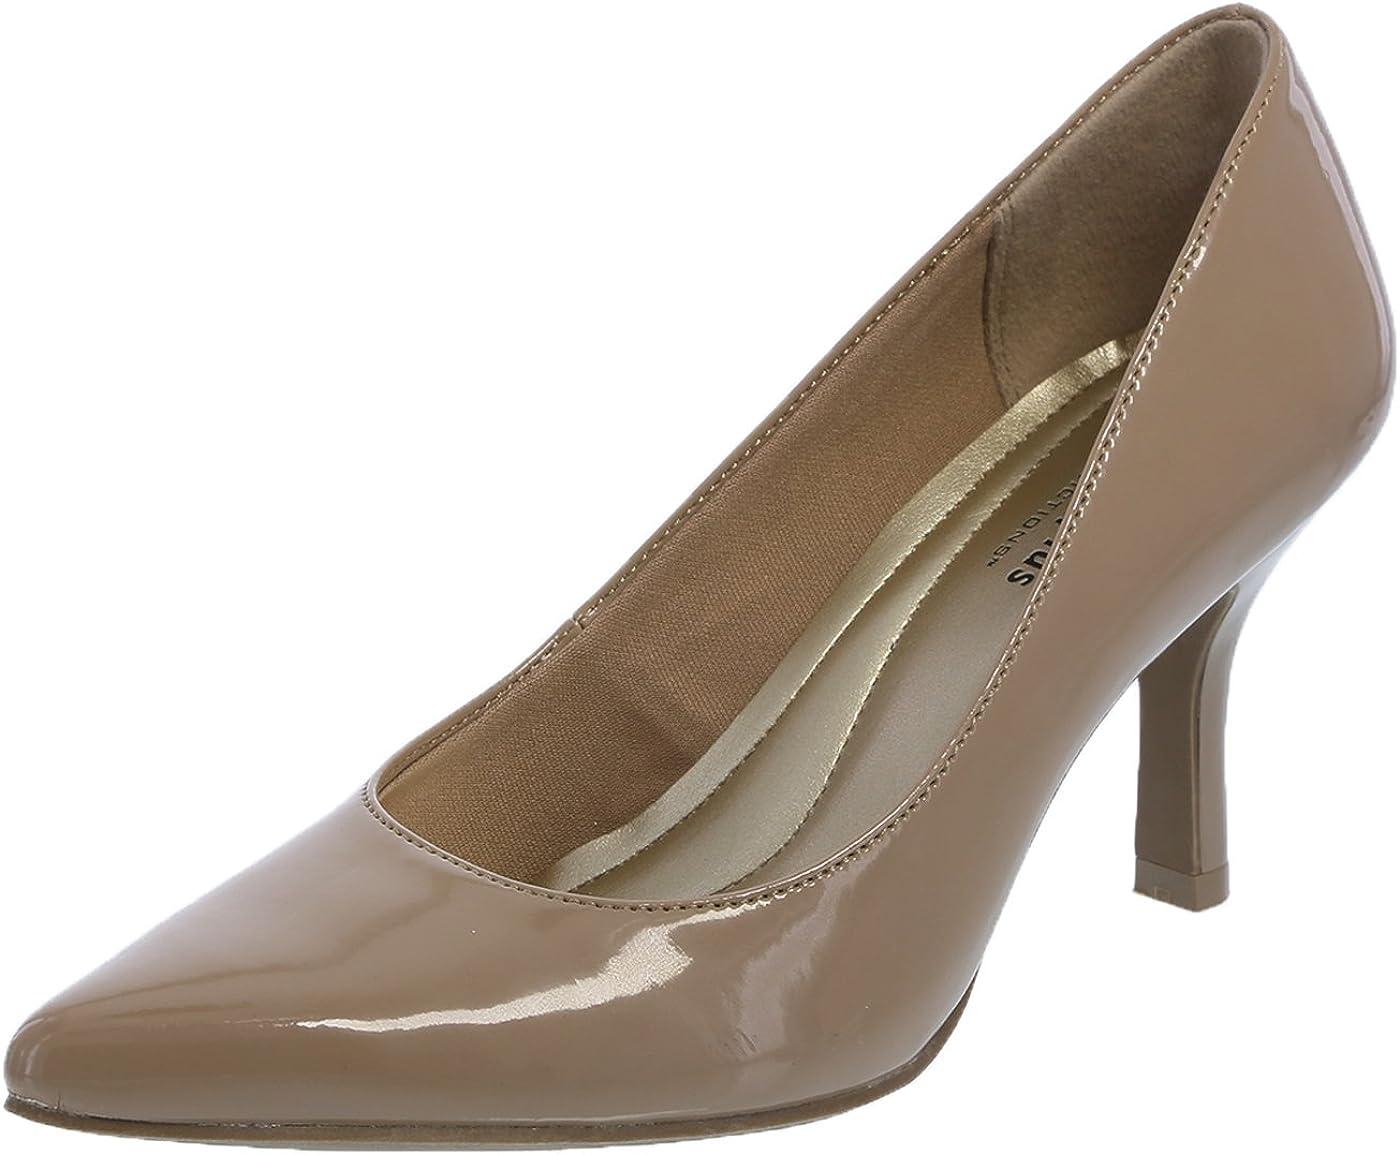 Amazon Com Predictions Comfort Plus Women S Nude Women S Janine Pointy Toe Pump 5 5 Regular Shoes